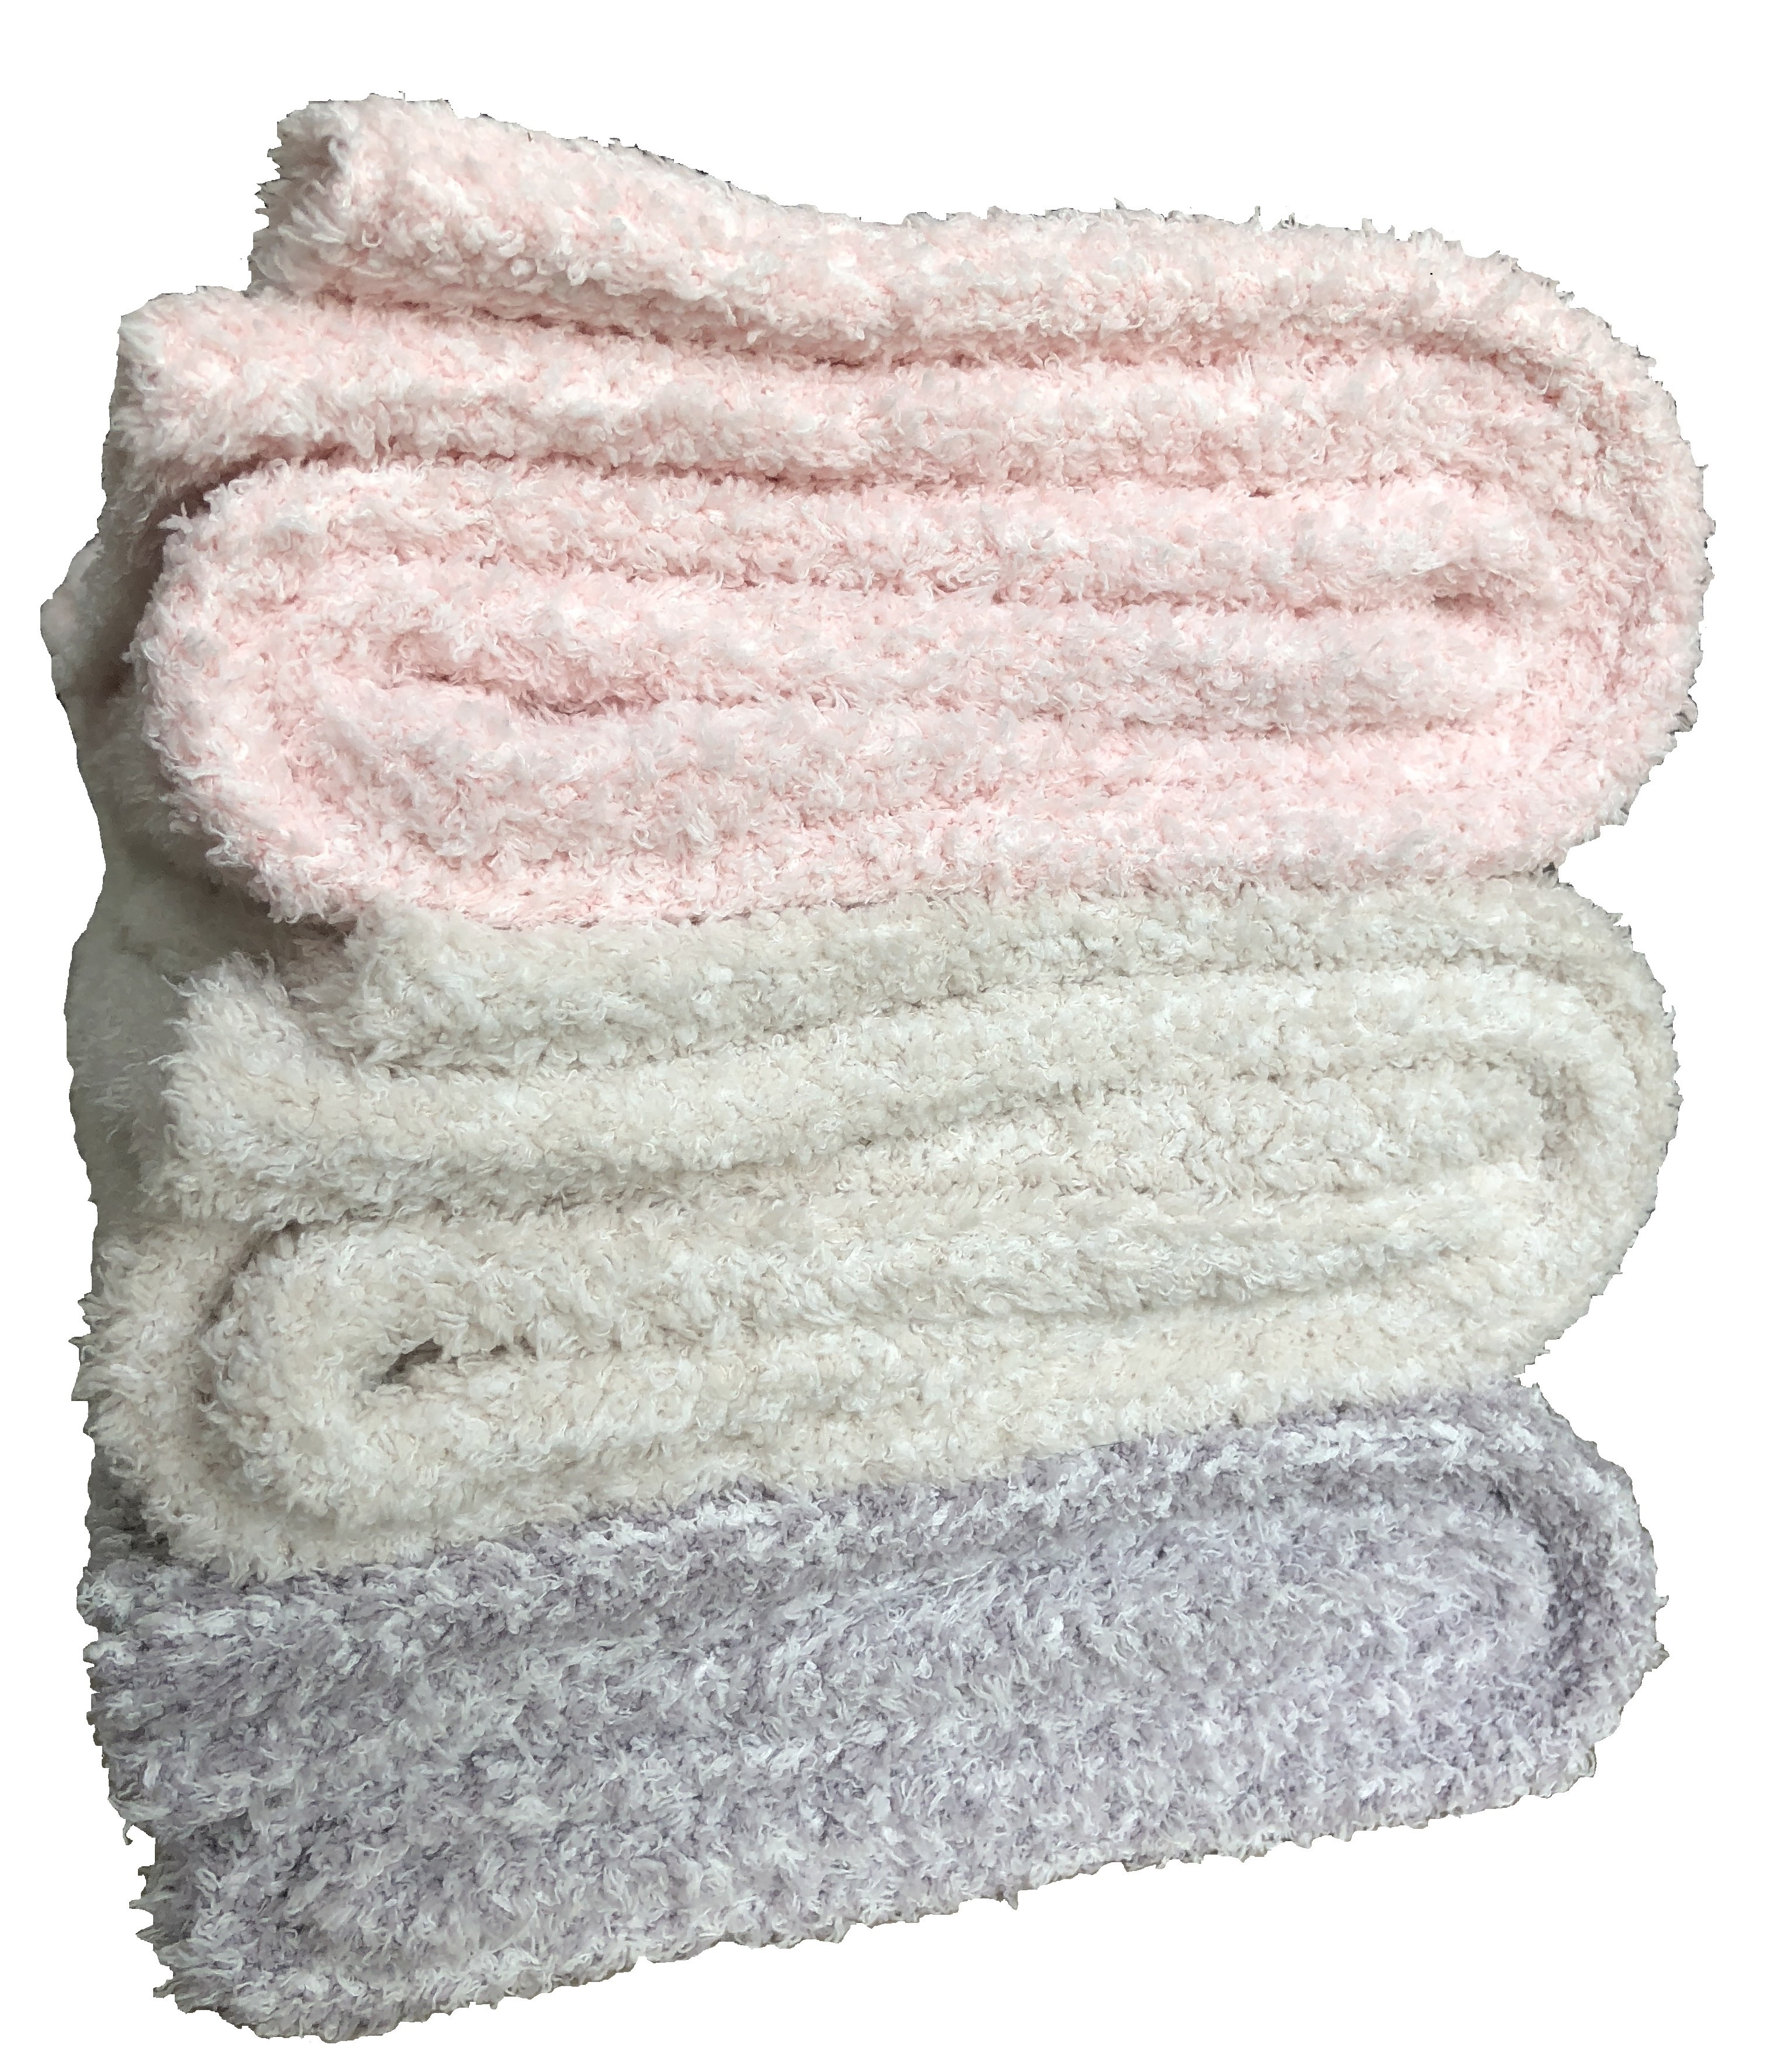 d2b95fce01624 Undie Couture Fluffy Plush Cozy Ribbed Throw Blanket - Walmart.com